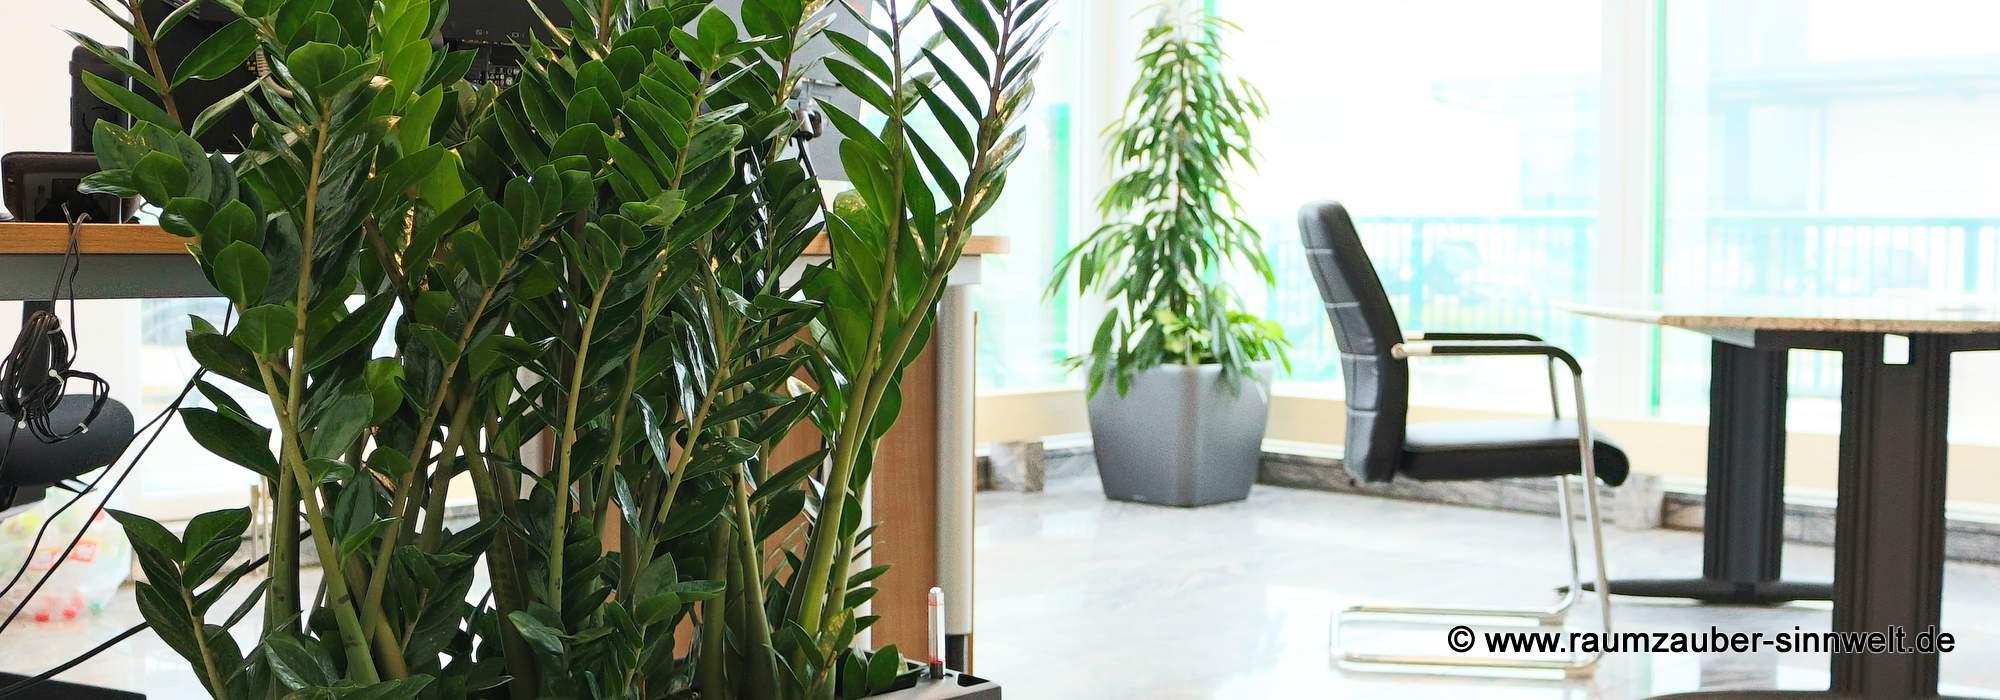 Green Office - Arbeiten im Grünen